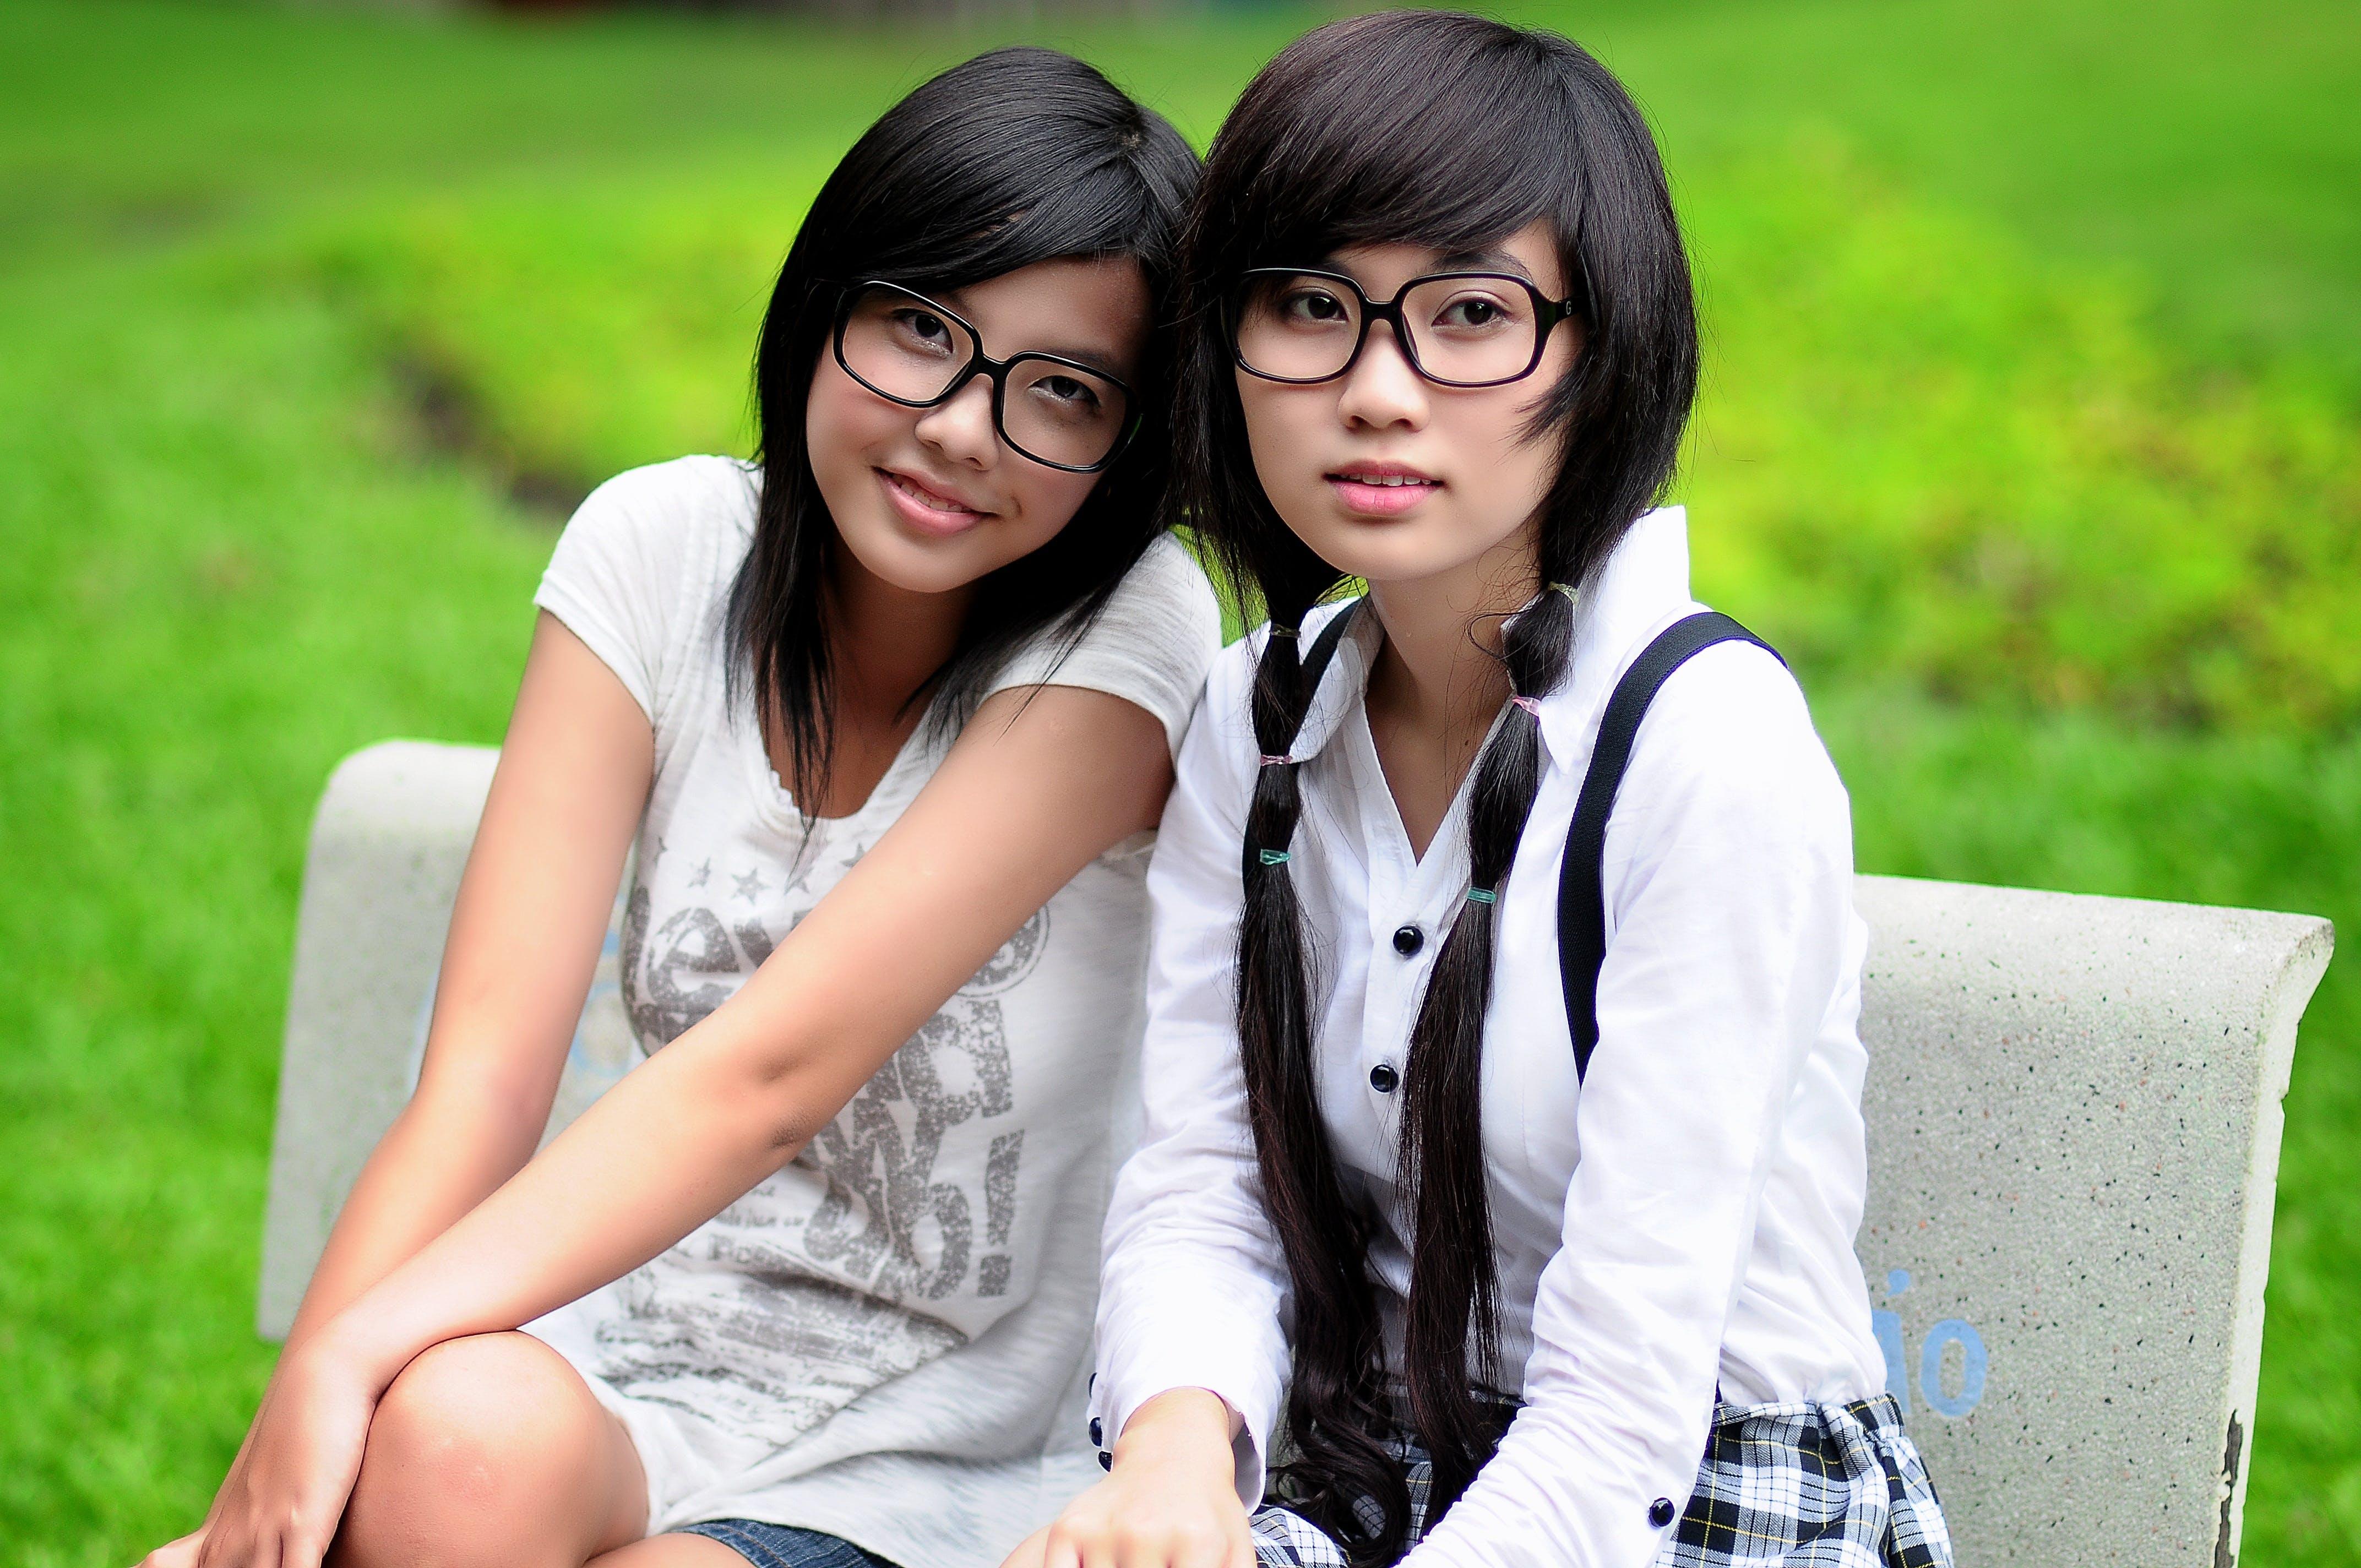 Asian, attractive, cute